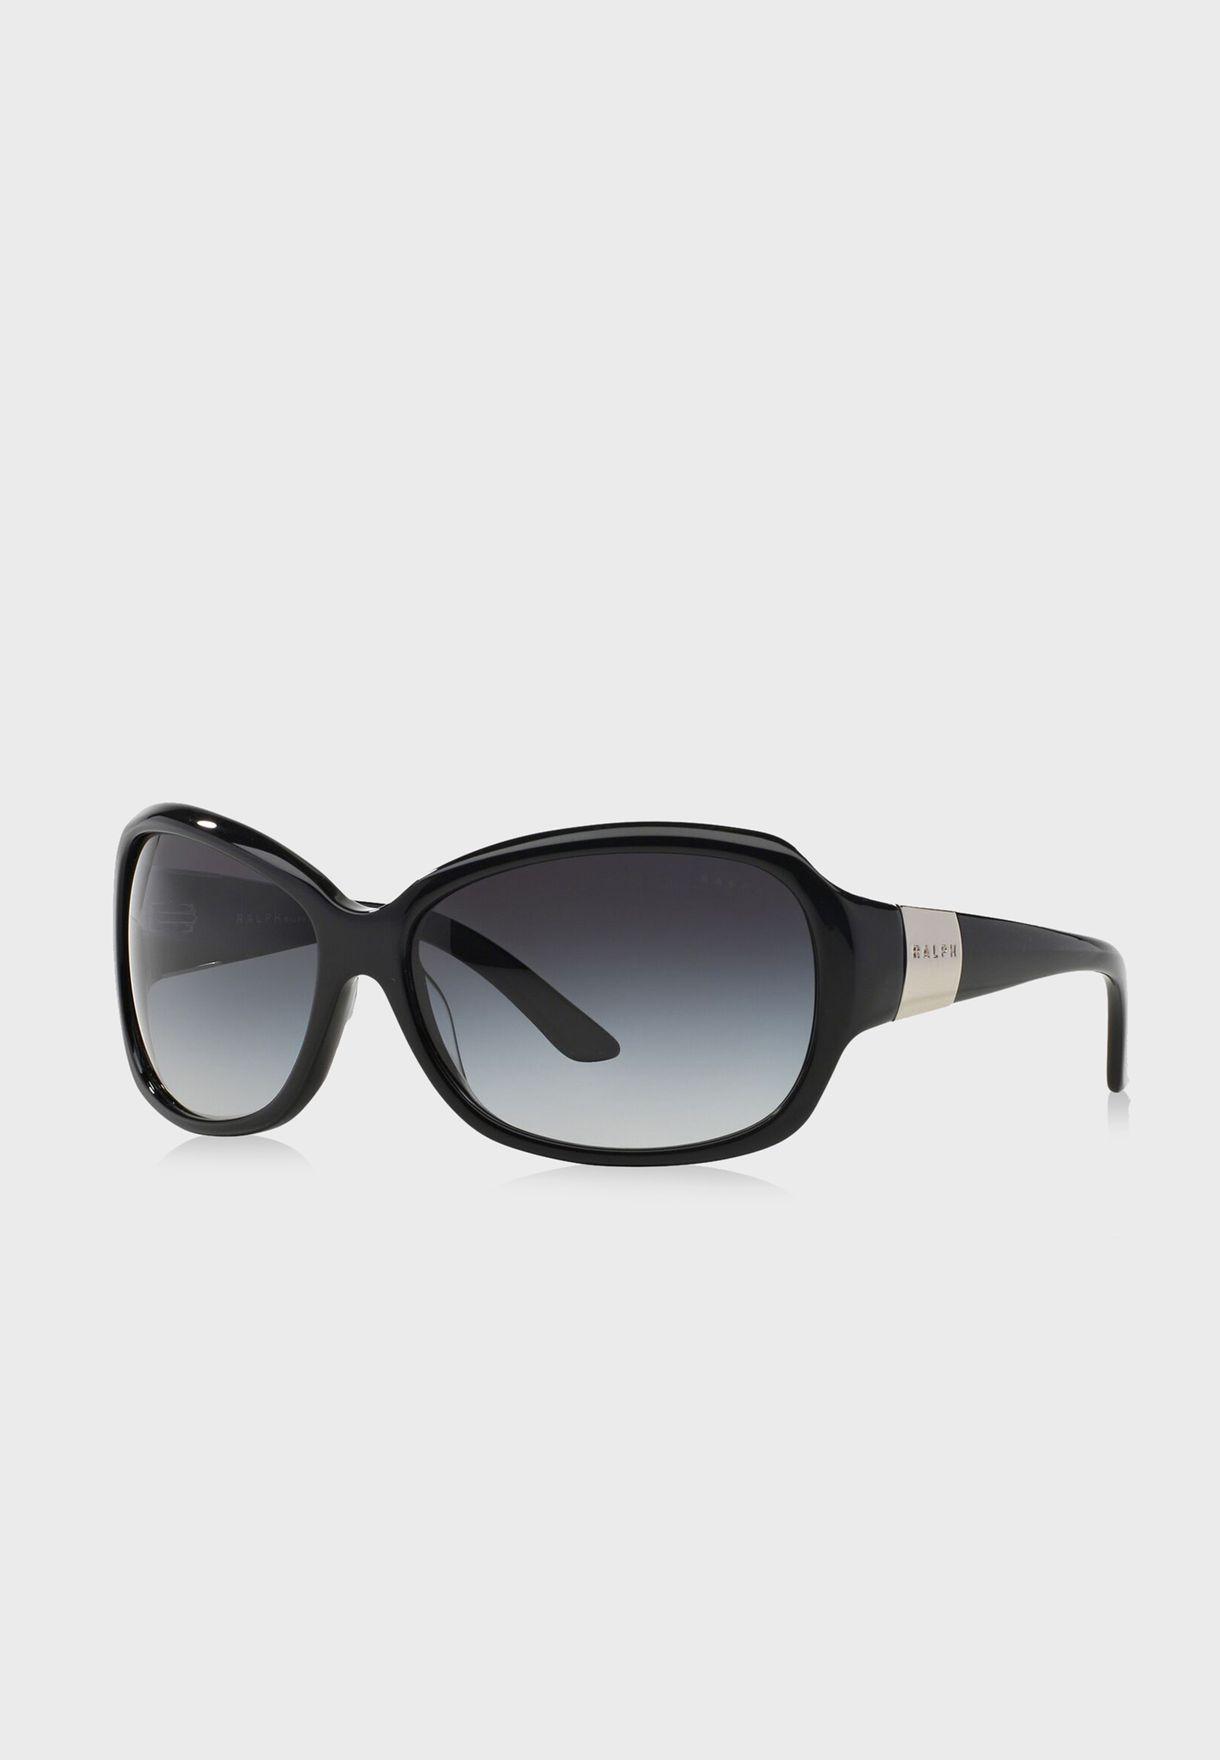 29e6307333f Shop Ralph Lauren Polo black Butterfly Sunglasses 805289135128 for ...